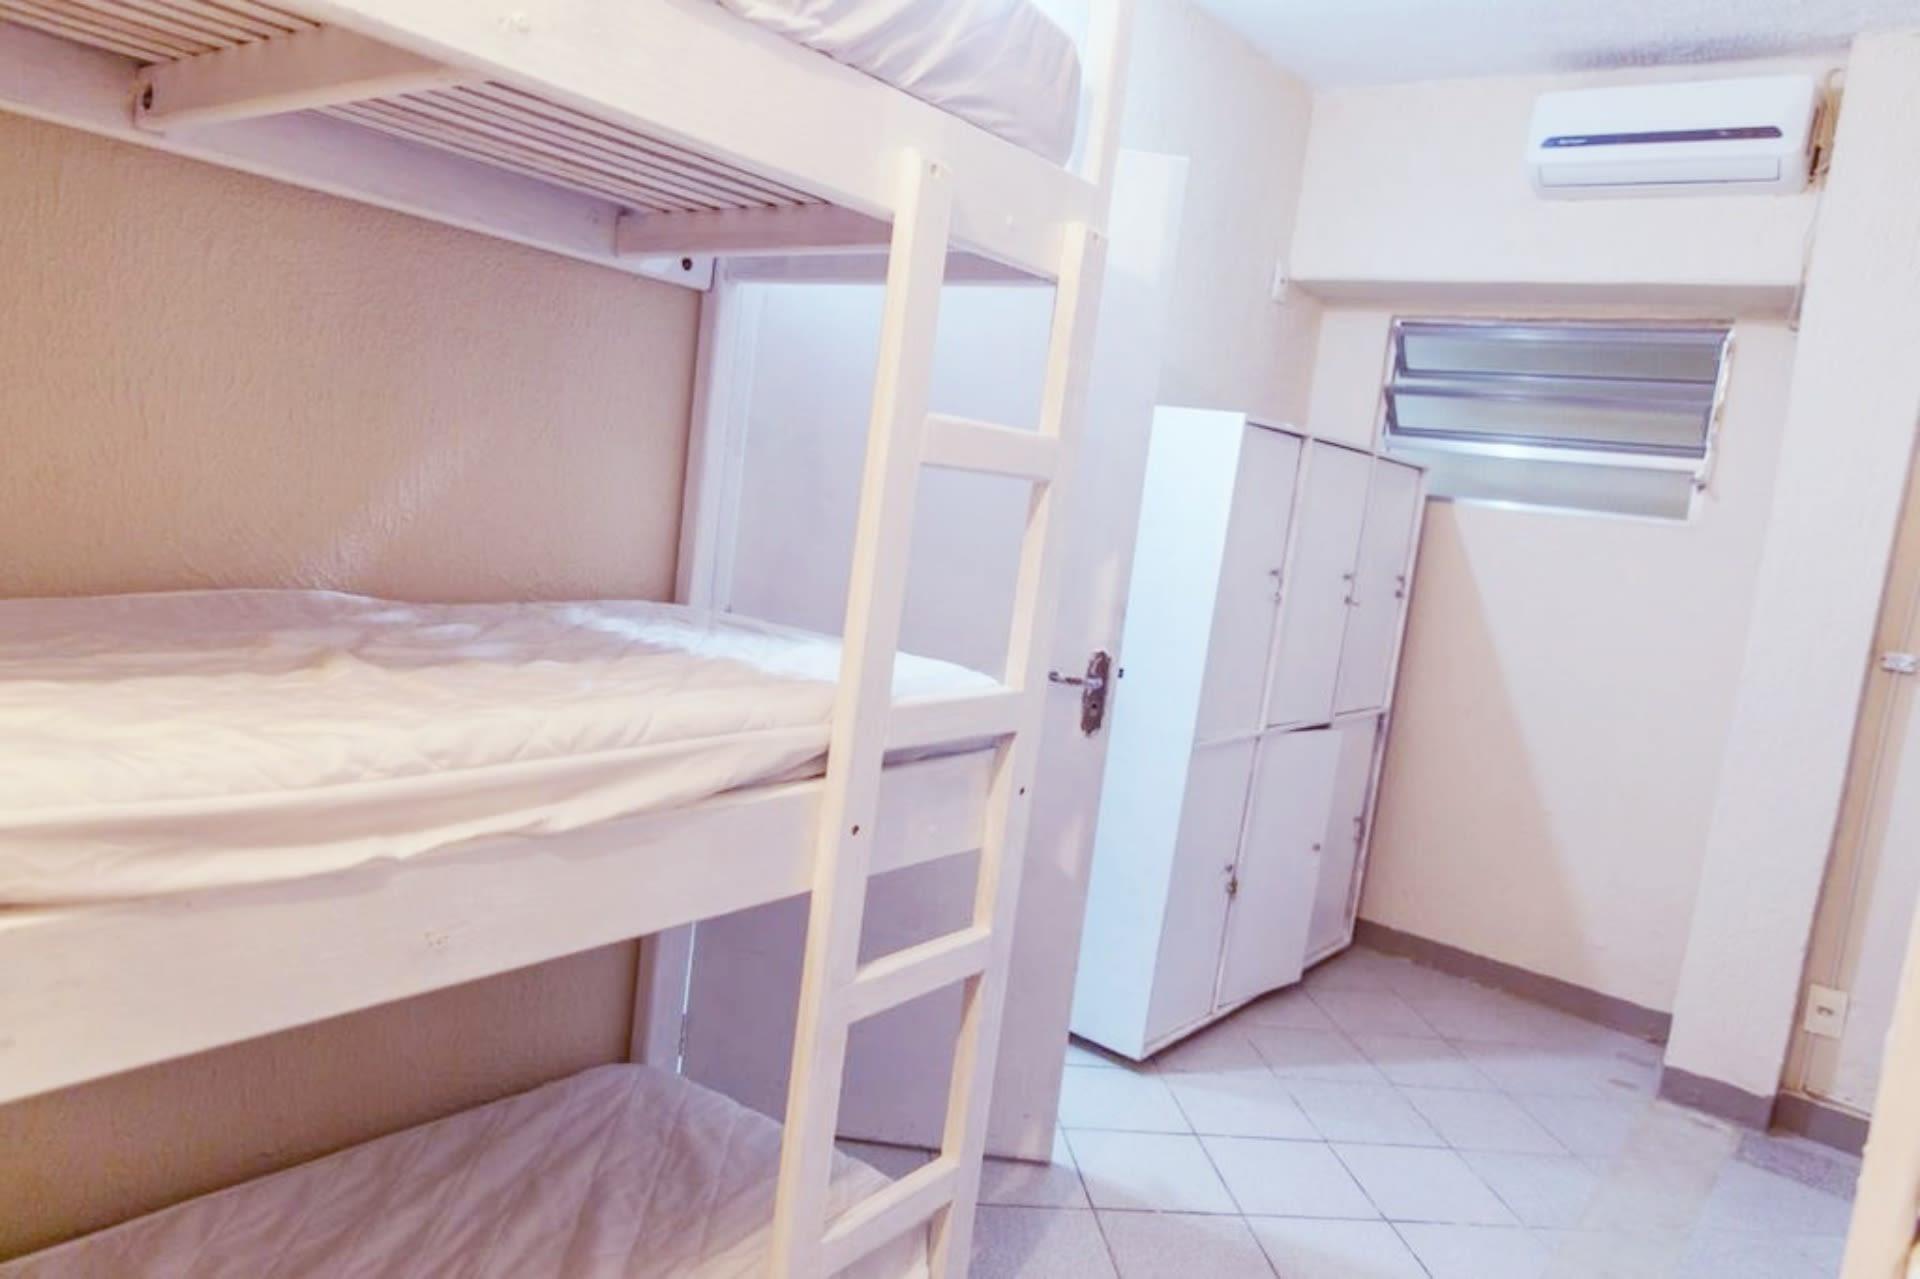 HOSTEL - Solar Hostel 4U Copacabana